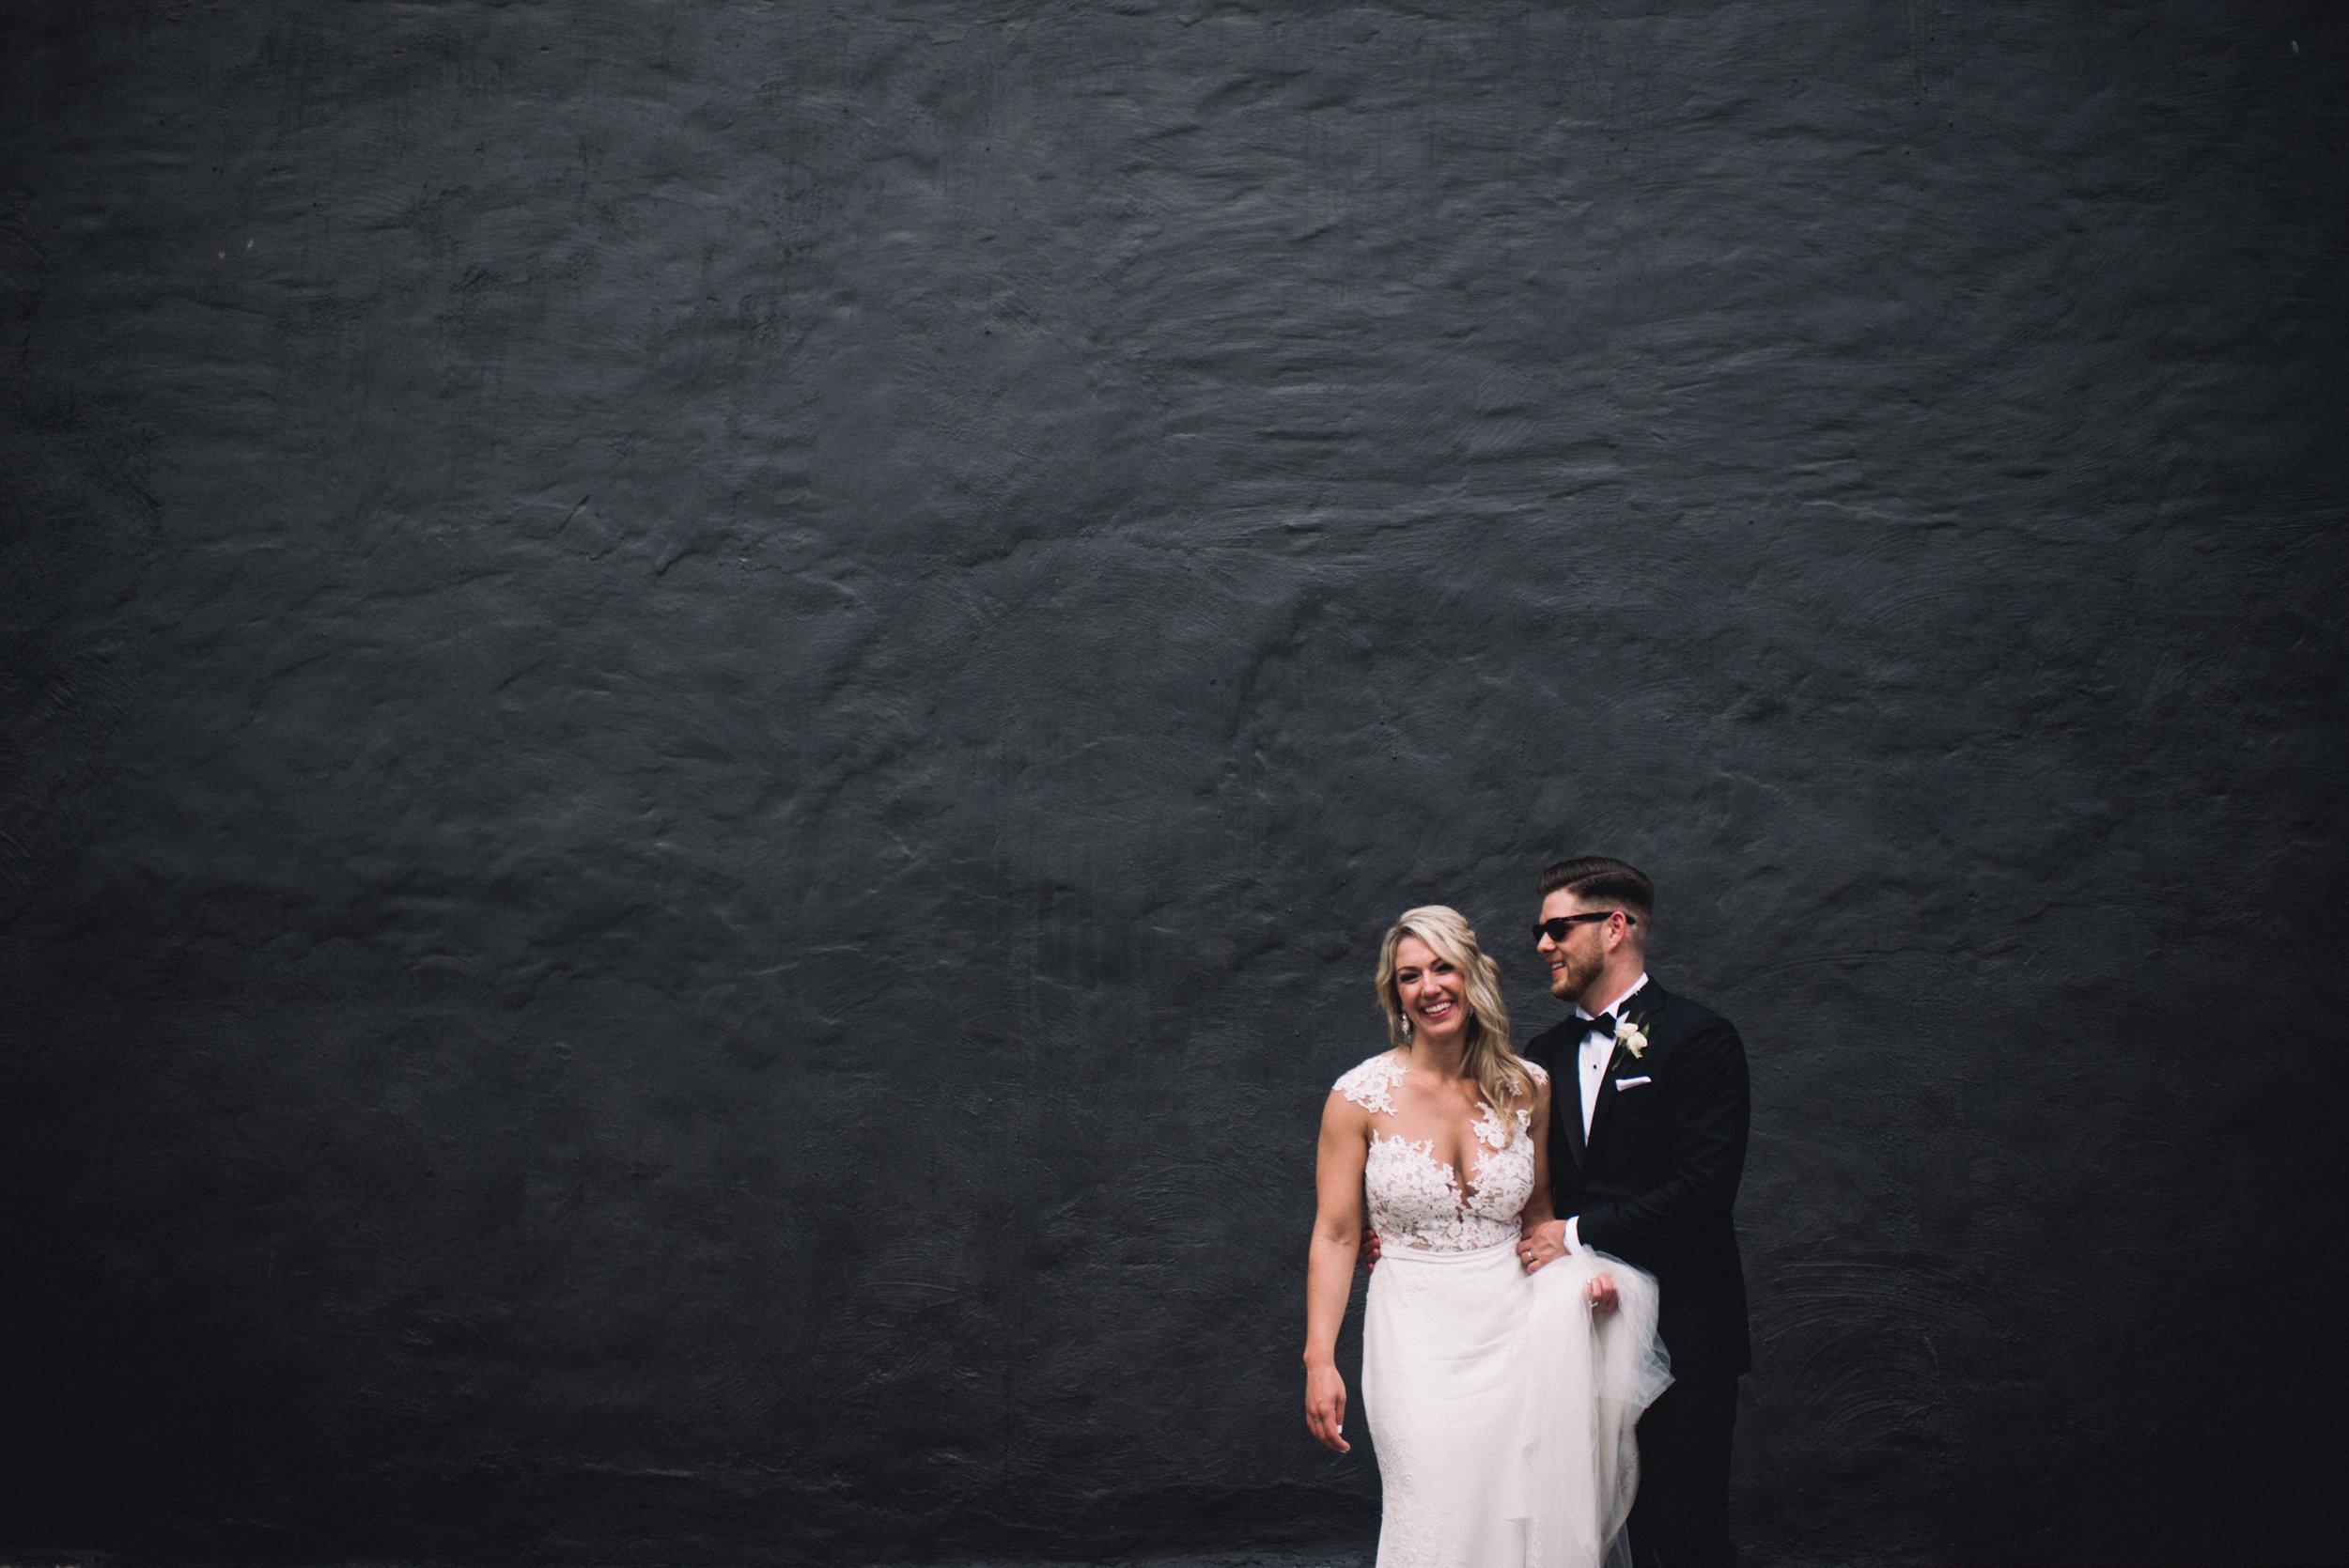 Pittsburgh Pennsylvania New York NYC Wedding Photographer Photojournalist Luxury Downtown Opera - Stirpe 1162.jpg